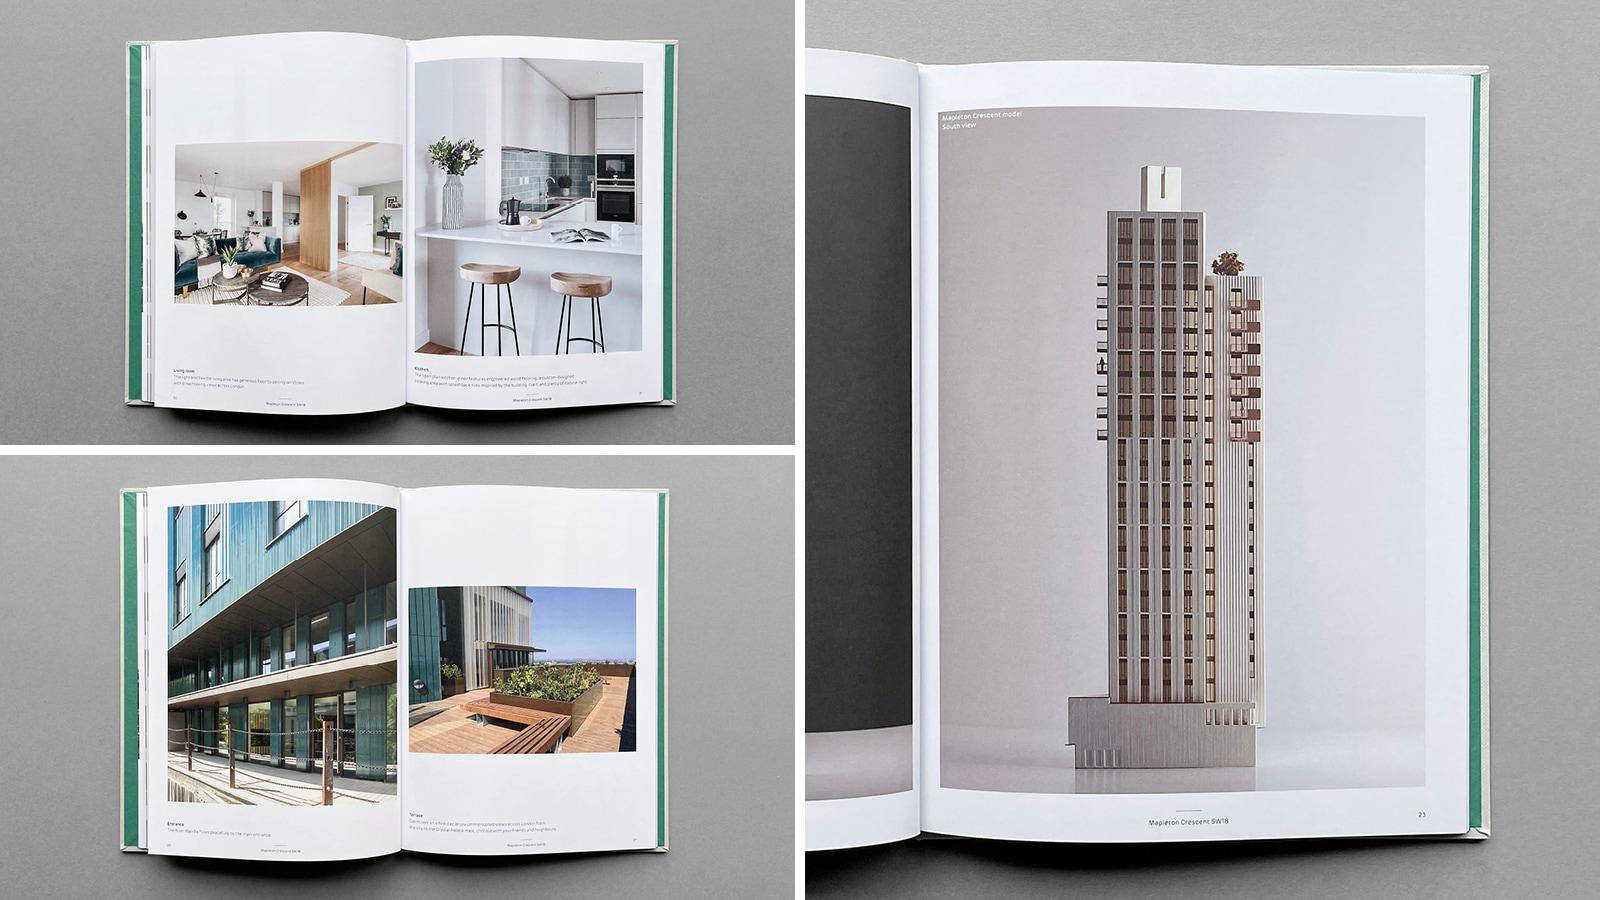 property-marketing-design-architecture-building-book-brochure-milton-keynes-london7